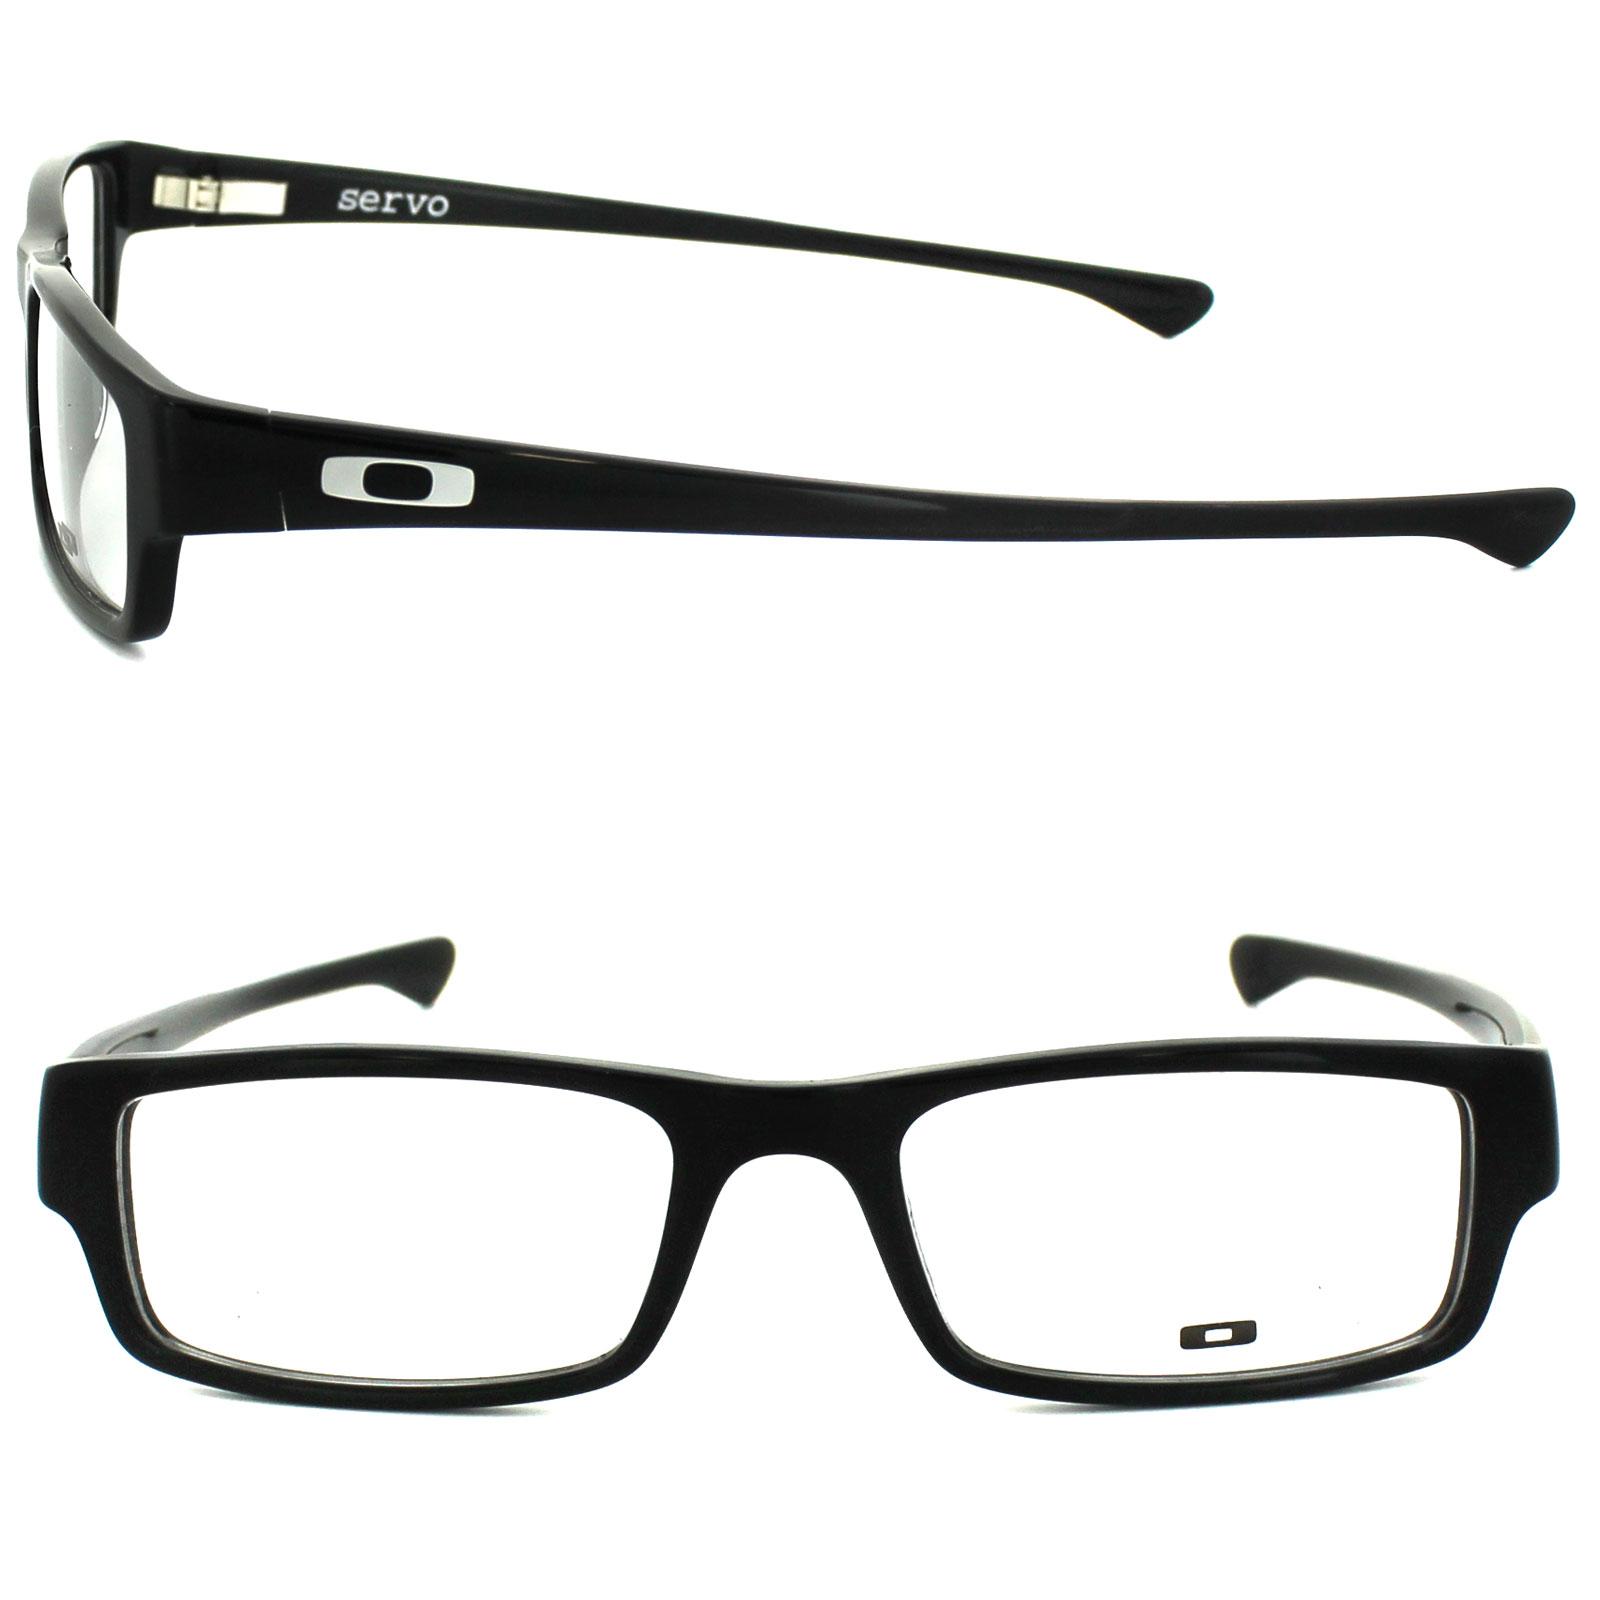 Oakley Glasses Frames Servo 1066-01 Polished Black 51mm   eBay